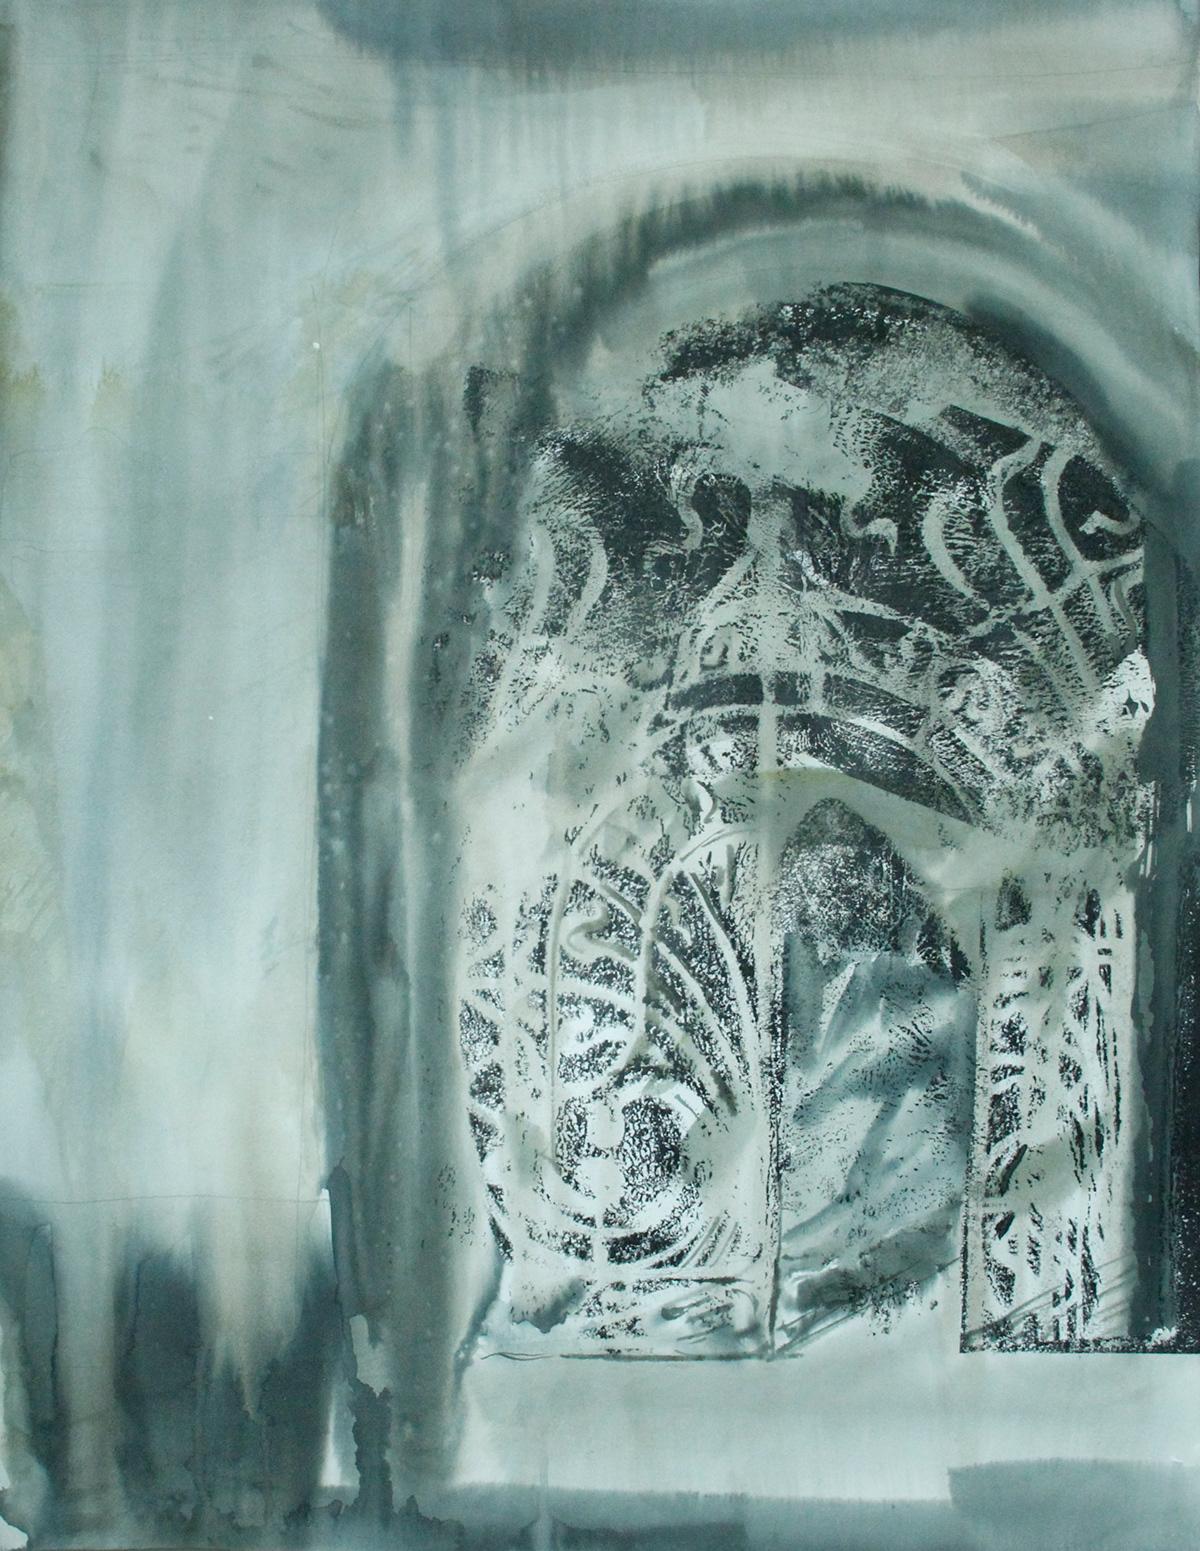 architecture art graphic art monohrome noir watercolor акварель архитектура графика нуар